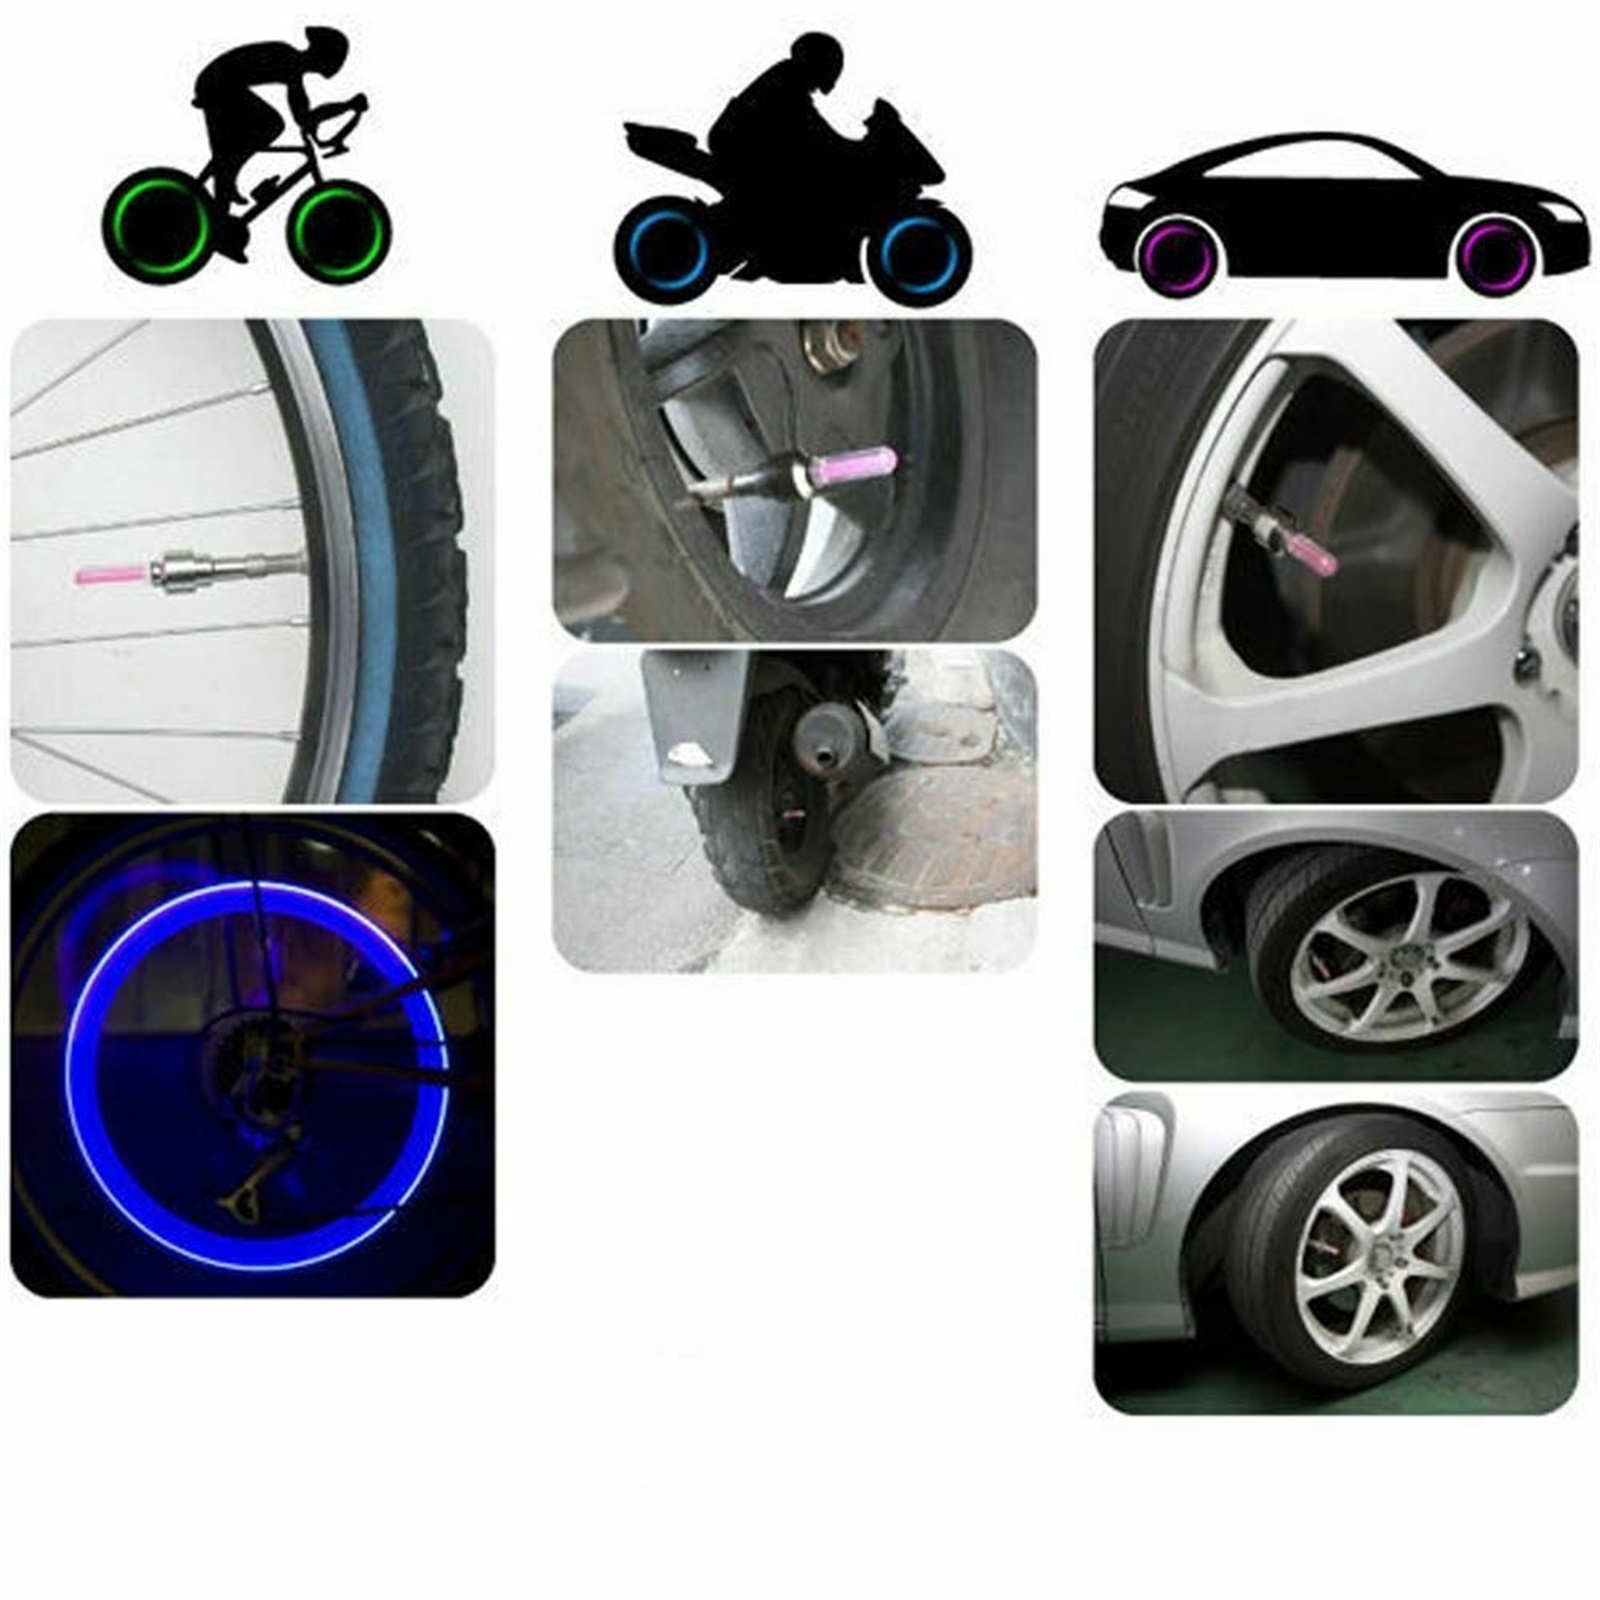 1-10X LED Valve Stem Cap Light Bike Bicycle Car Motorcycle Wheel Tire Lights SS